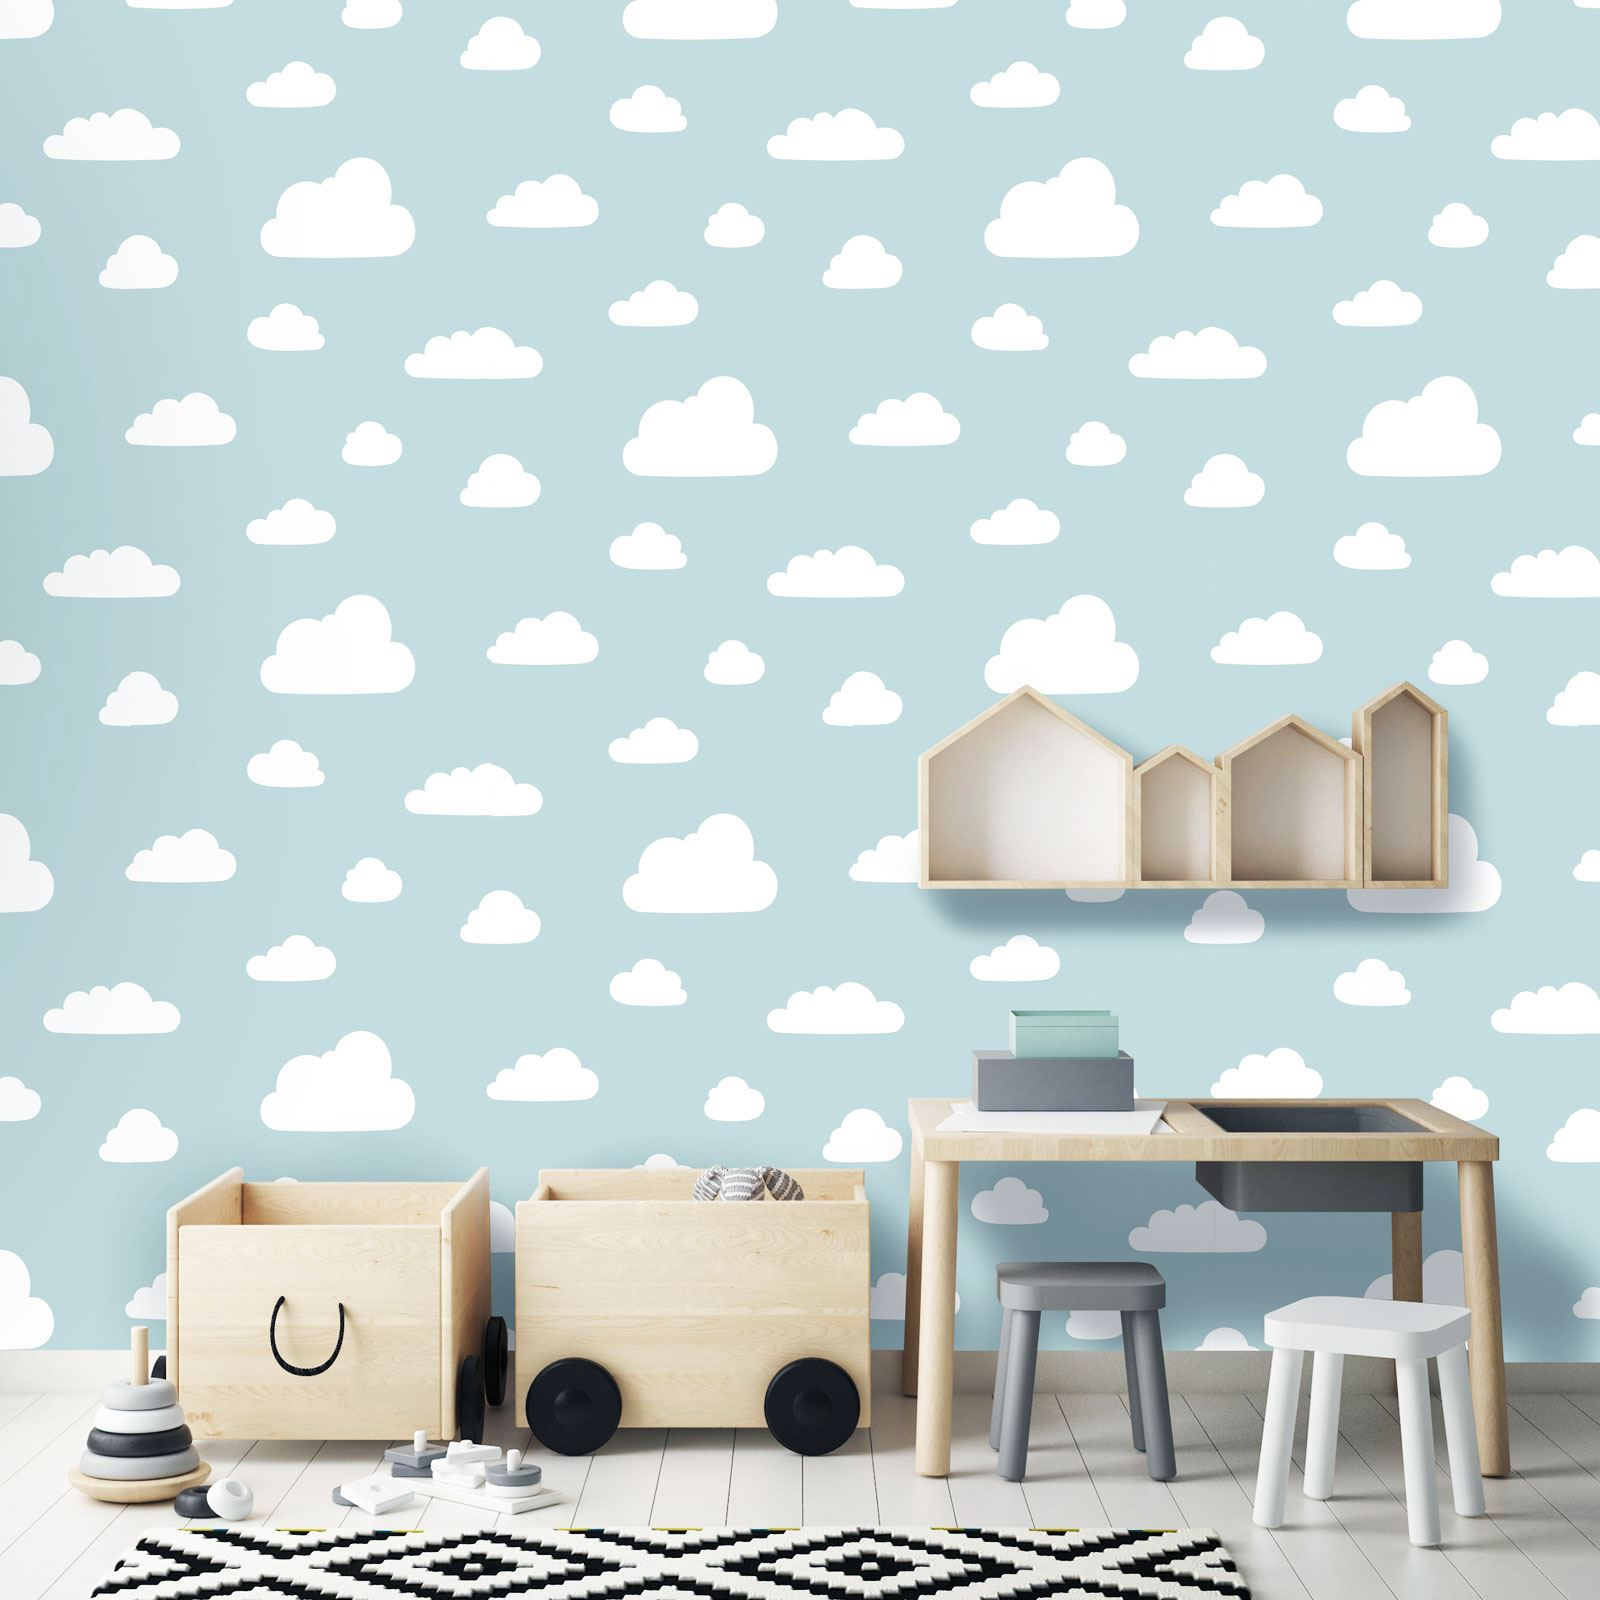 Kinderzimmer Tapete Ideen Junge Caseconrad Com